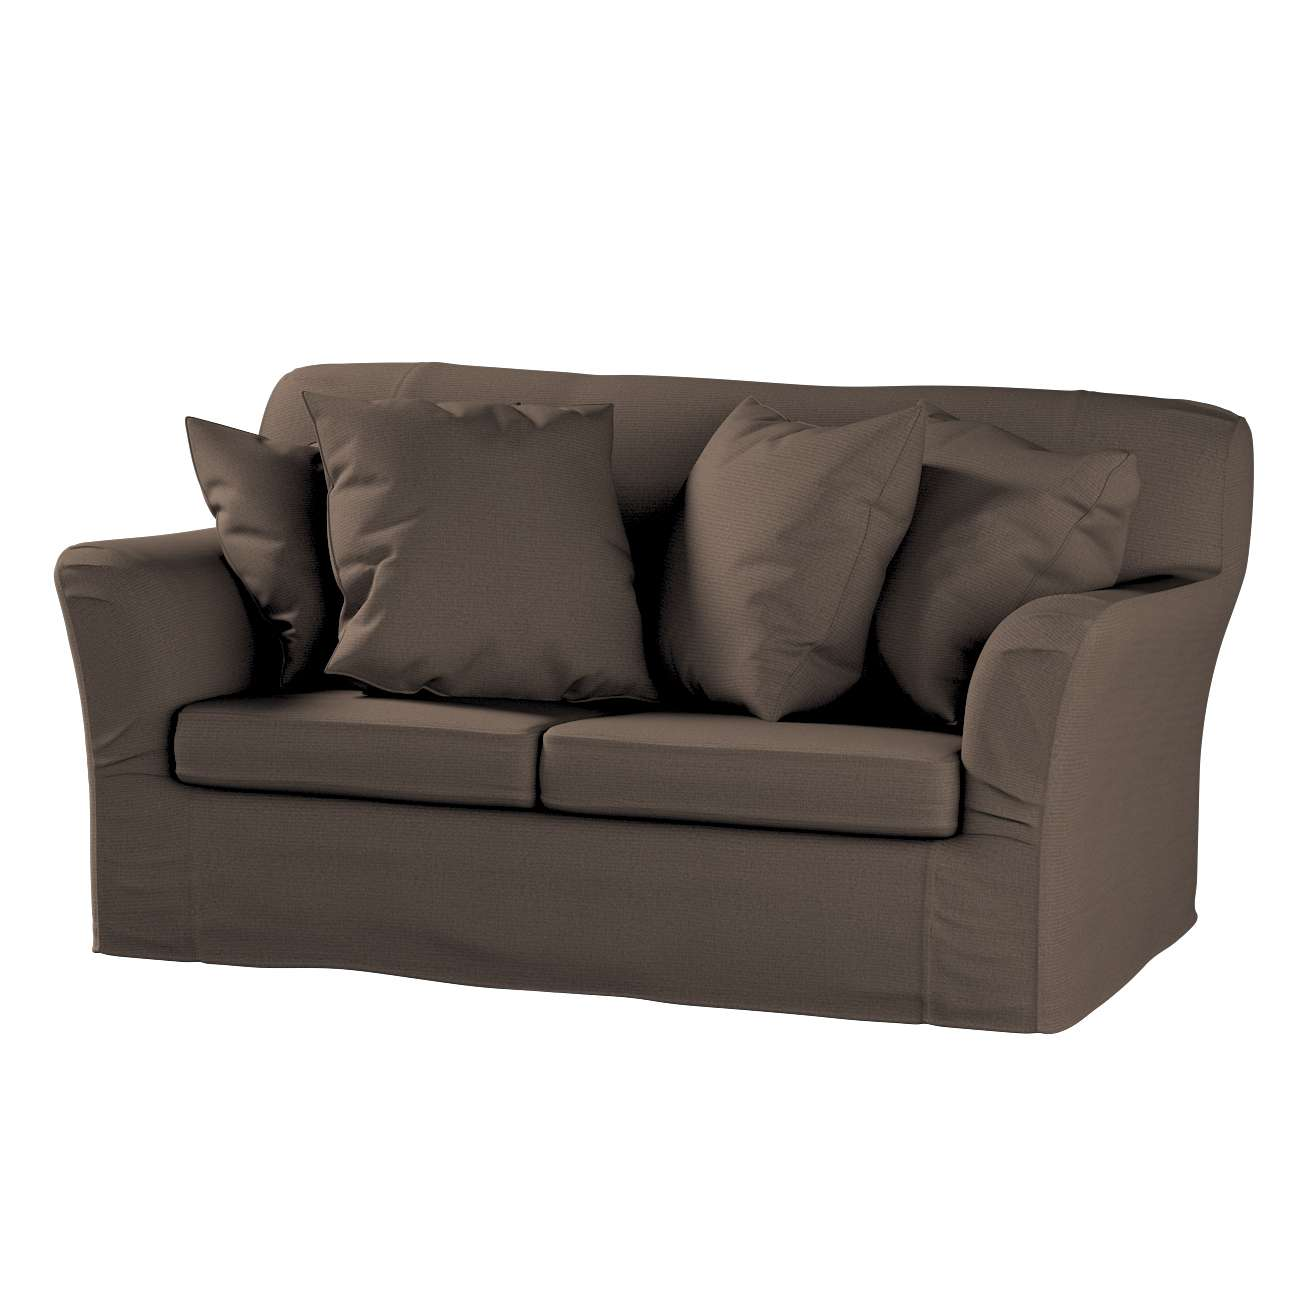 TOMELILLA  dvivietės sofos užvalkalas TOMELILLA dvivietė sofa kolekcijoje Etna , audinys: 705-08